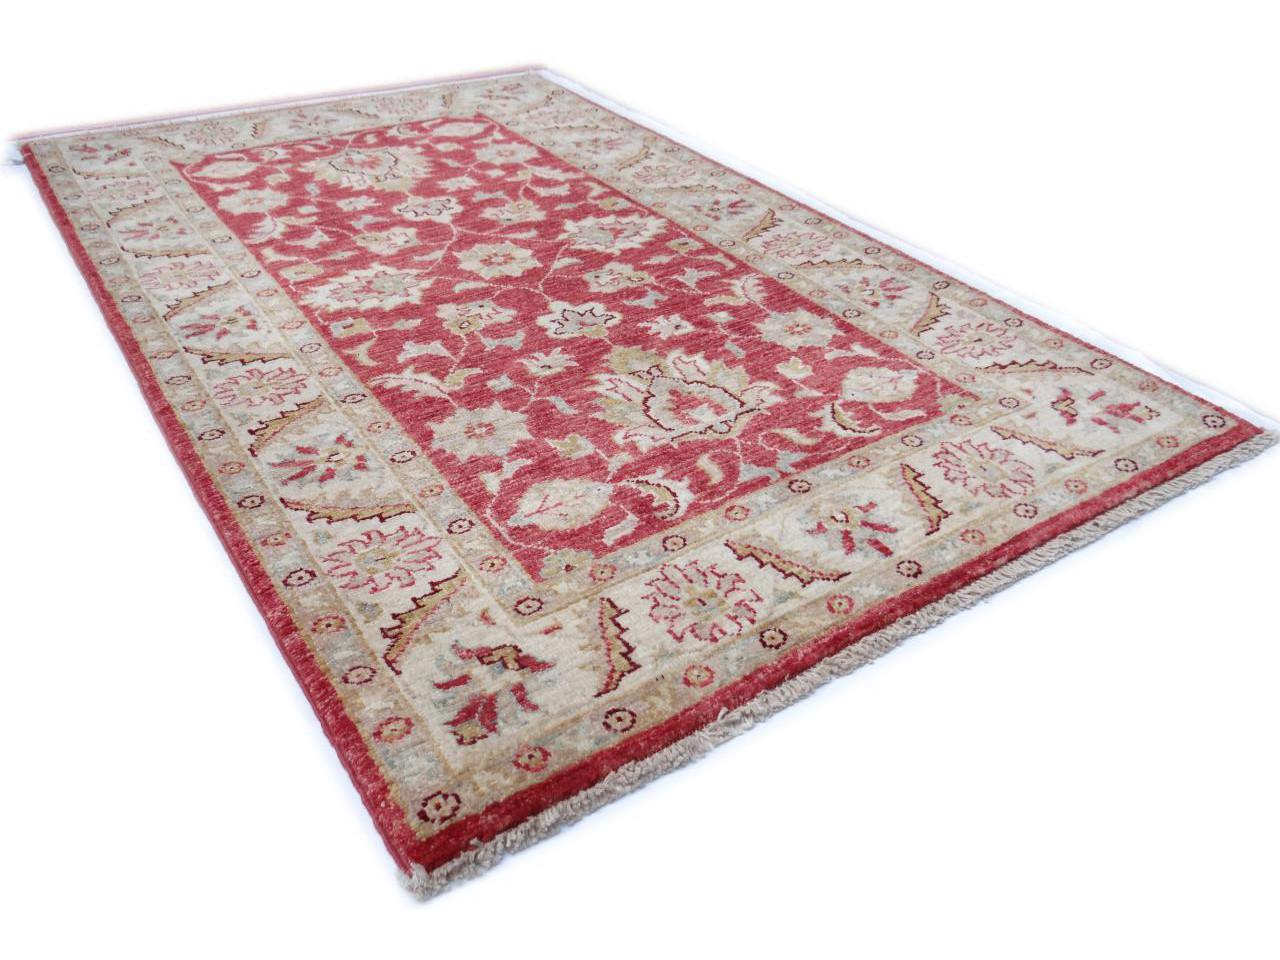 azarchoub fin tapis ziegler n 24071 135x84cm. Black Bedroom Furniture Sets. Home Design Ideas